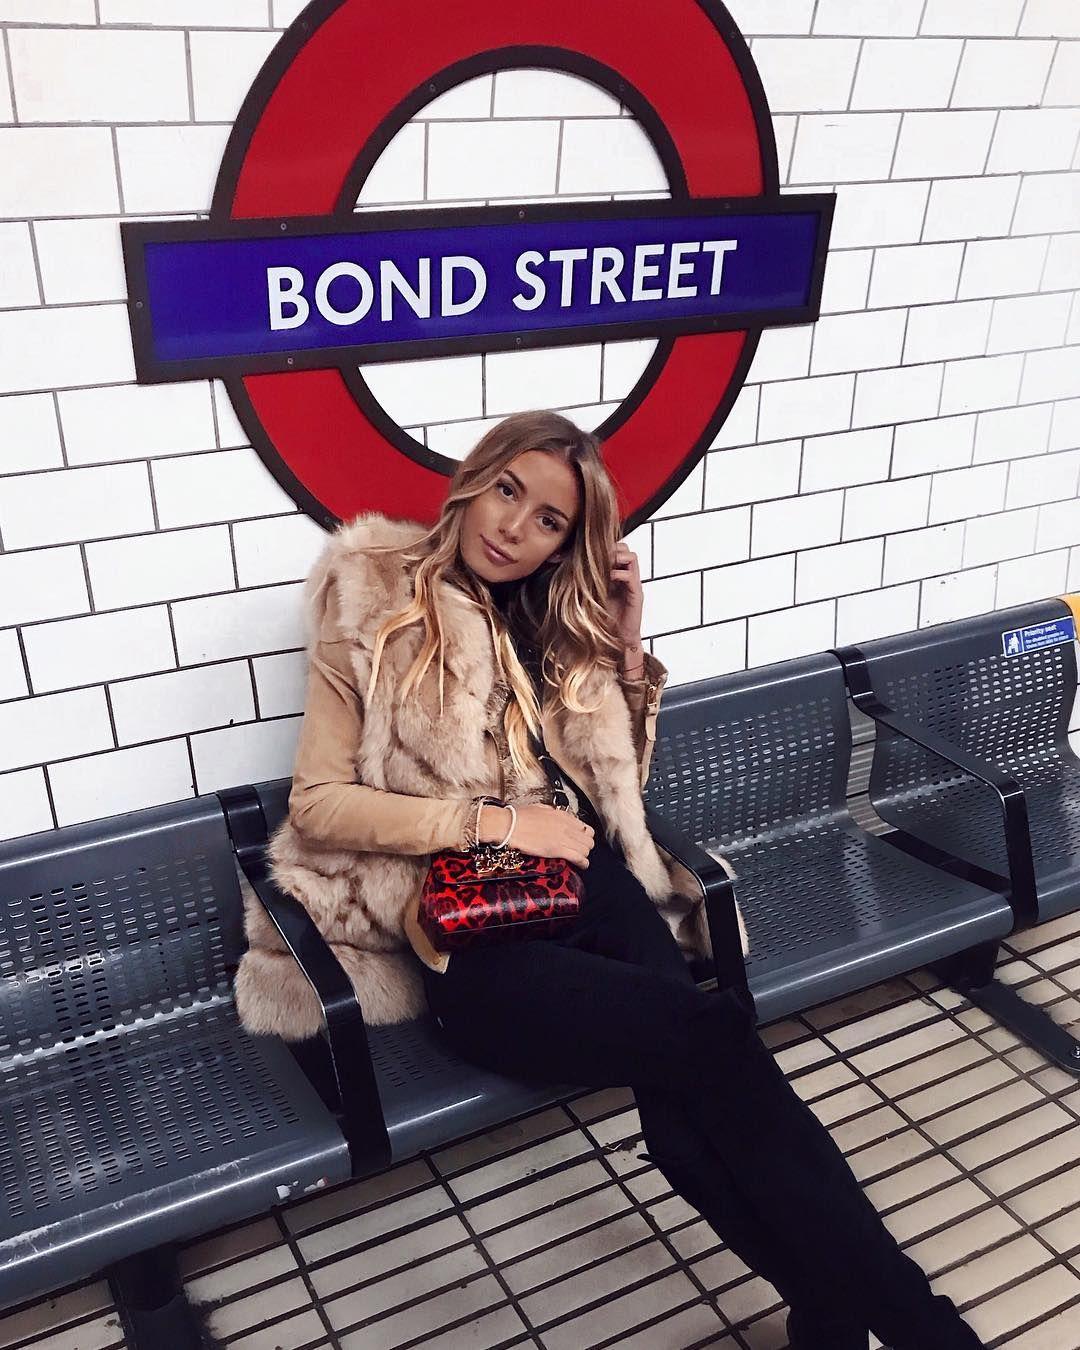 ", Tatjana Catic on Instagram: ""*please mind the gap 🇬🇧"", My Travels Blog 2020, My Travels Blog 2020"